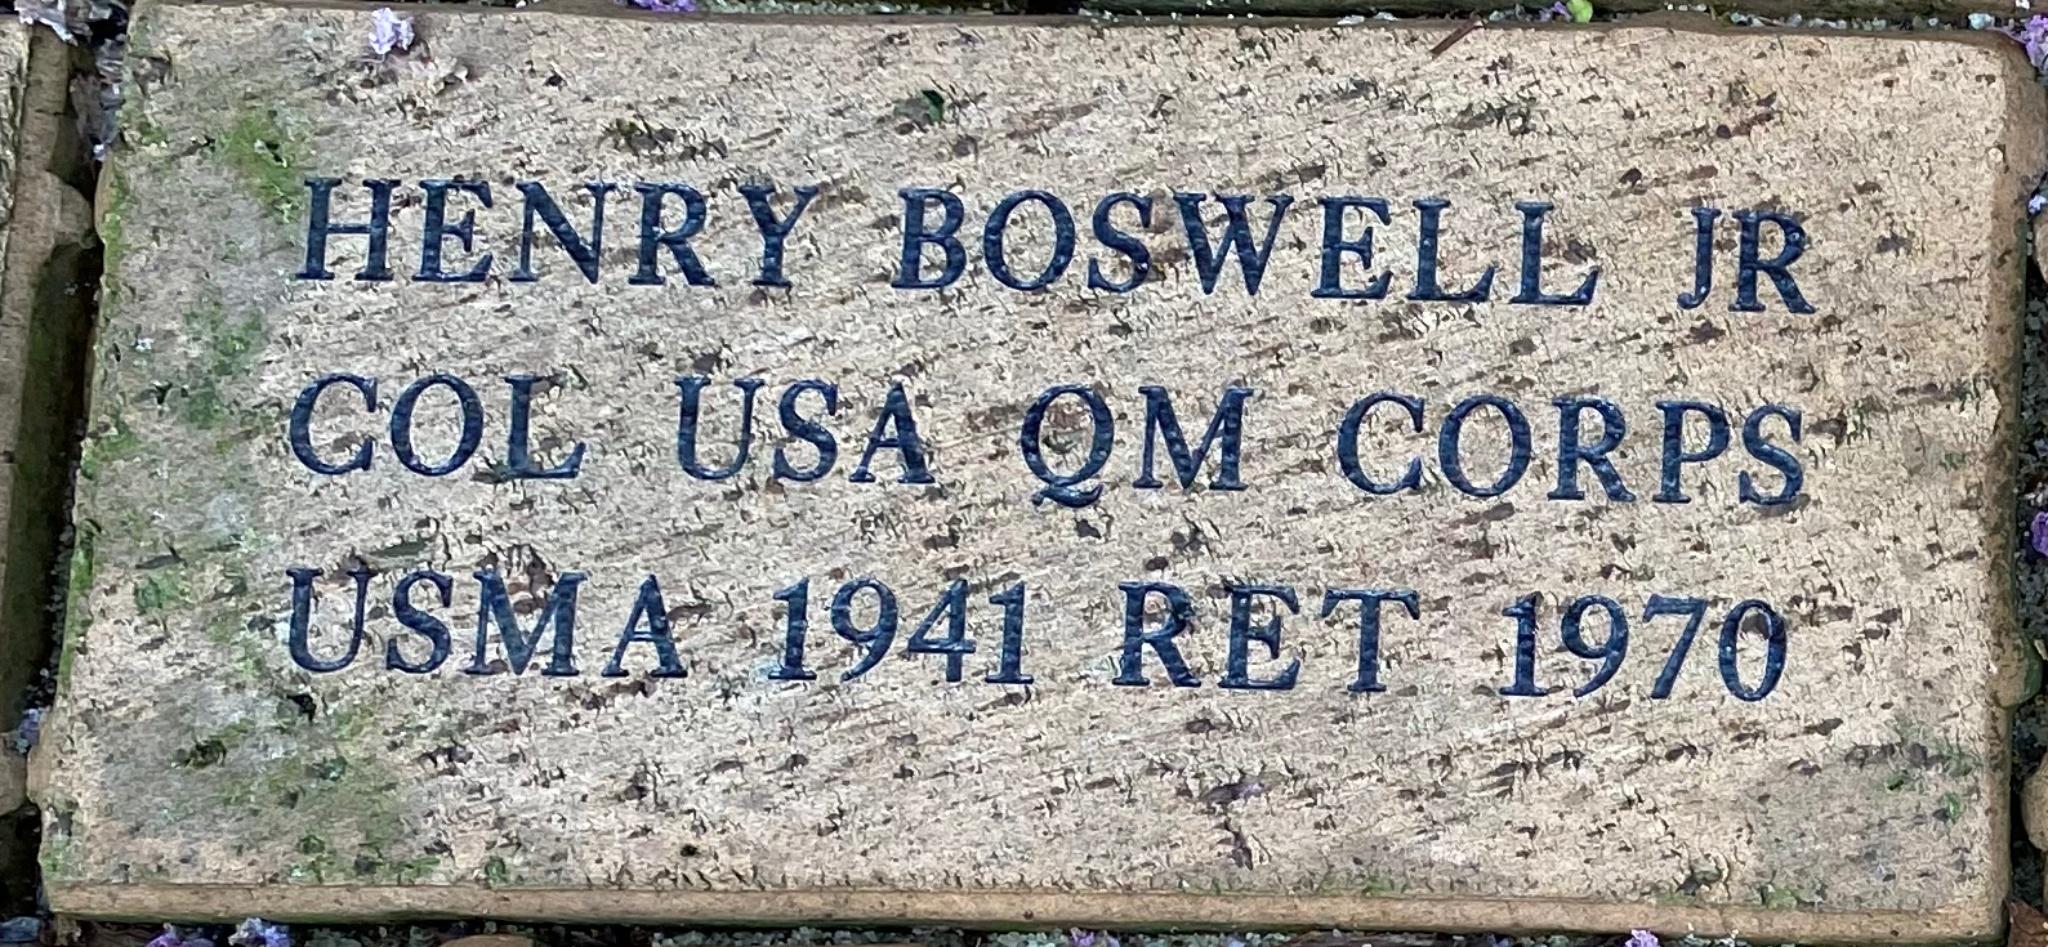 HENRY BOSWELL JR COL USA QM CORPS USMA 1941 RET 1970